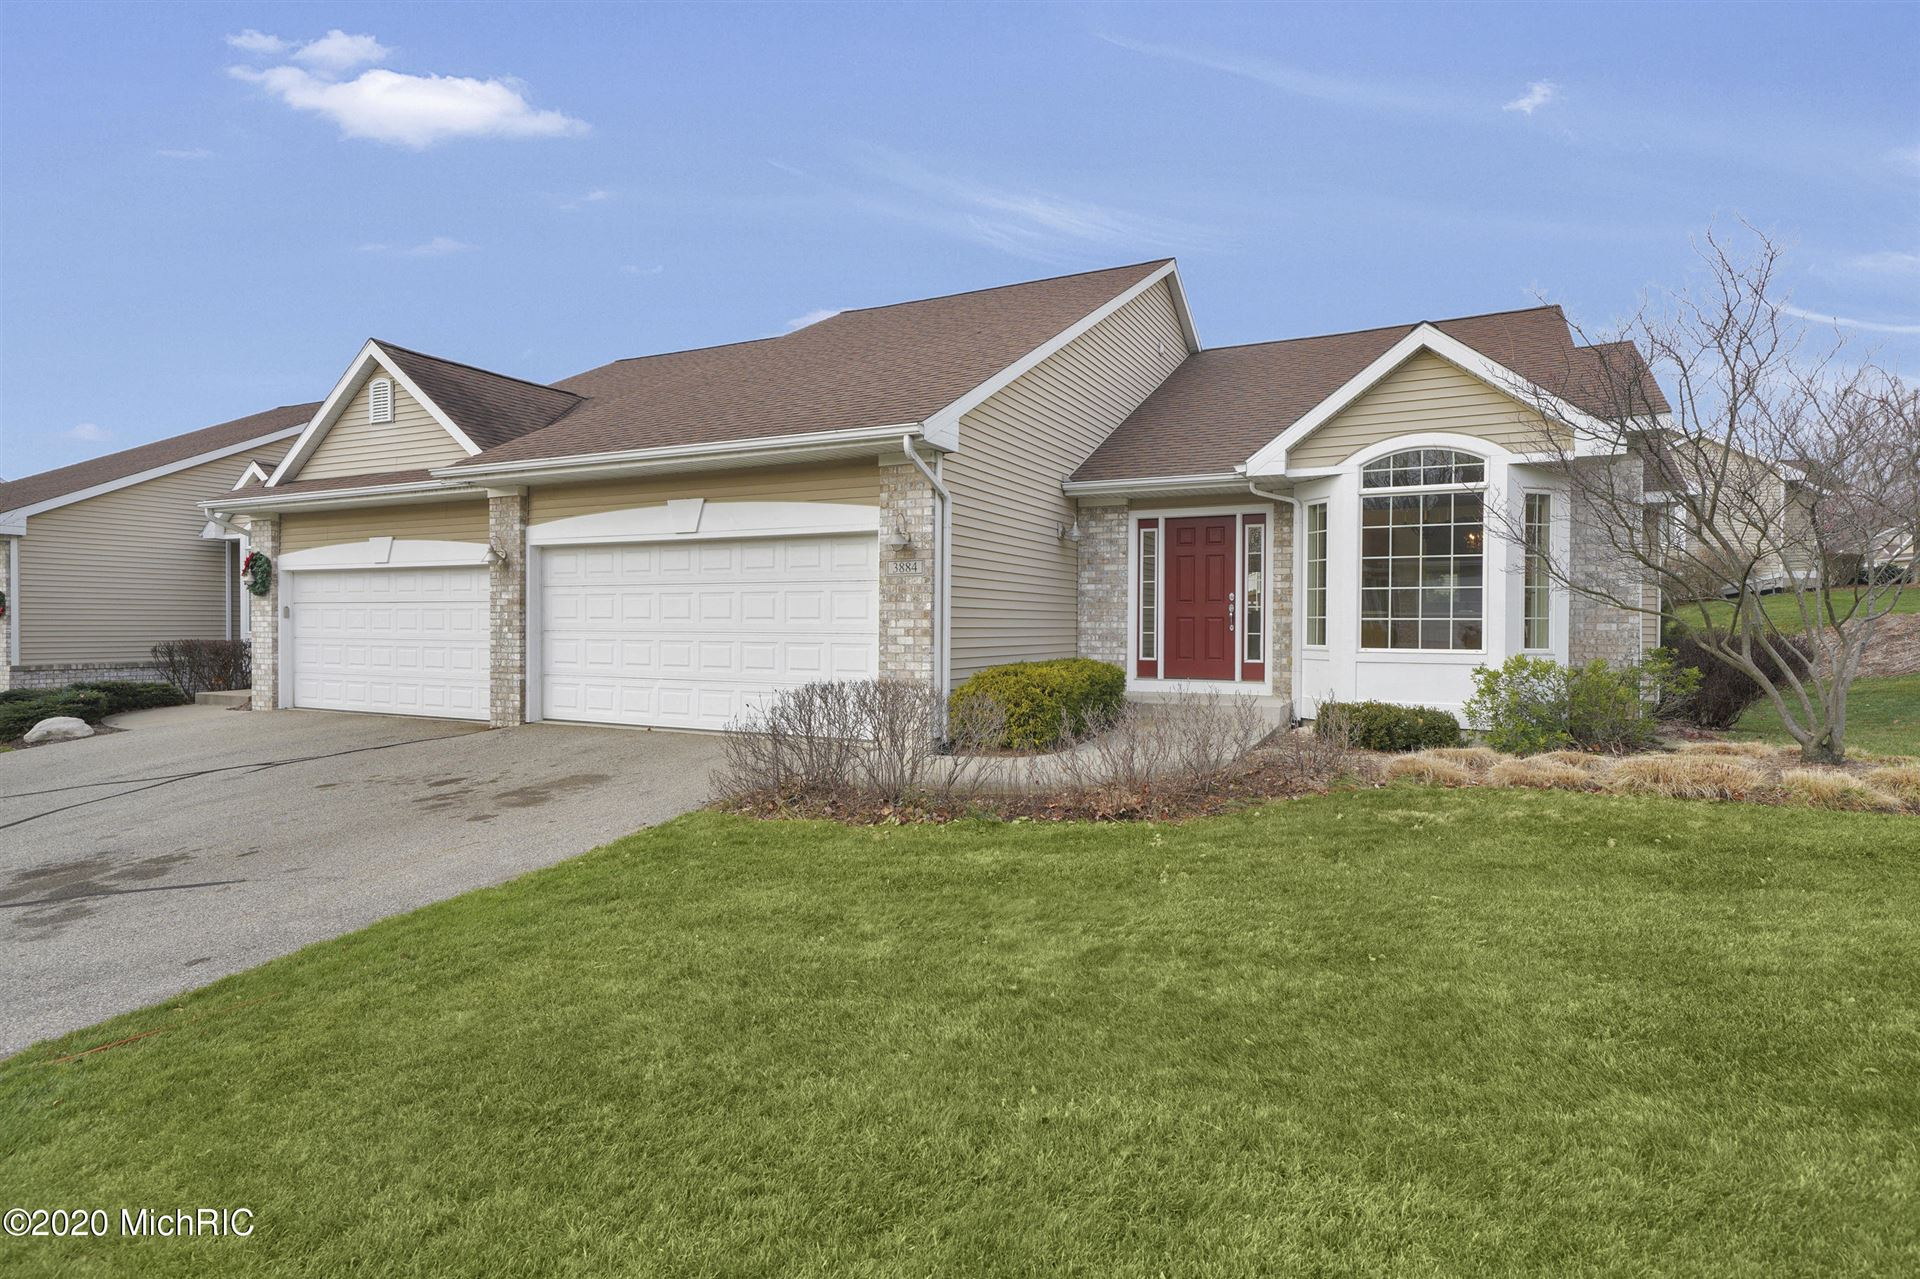 3884 Pemberton Drive SE #49, Grand Rapids, MI 49508 - MLS#: 21000459